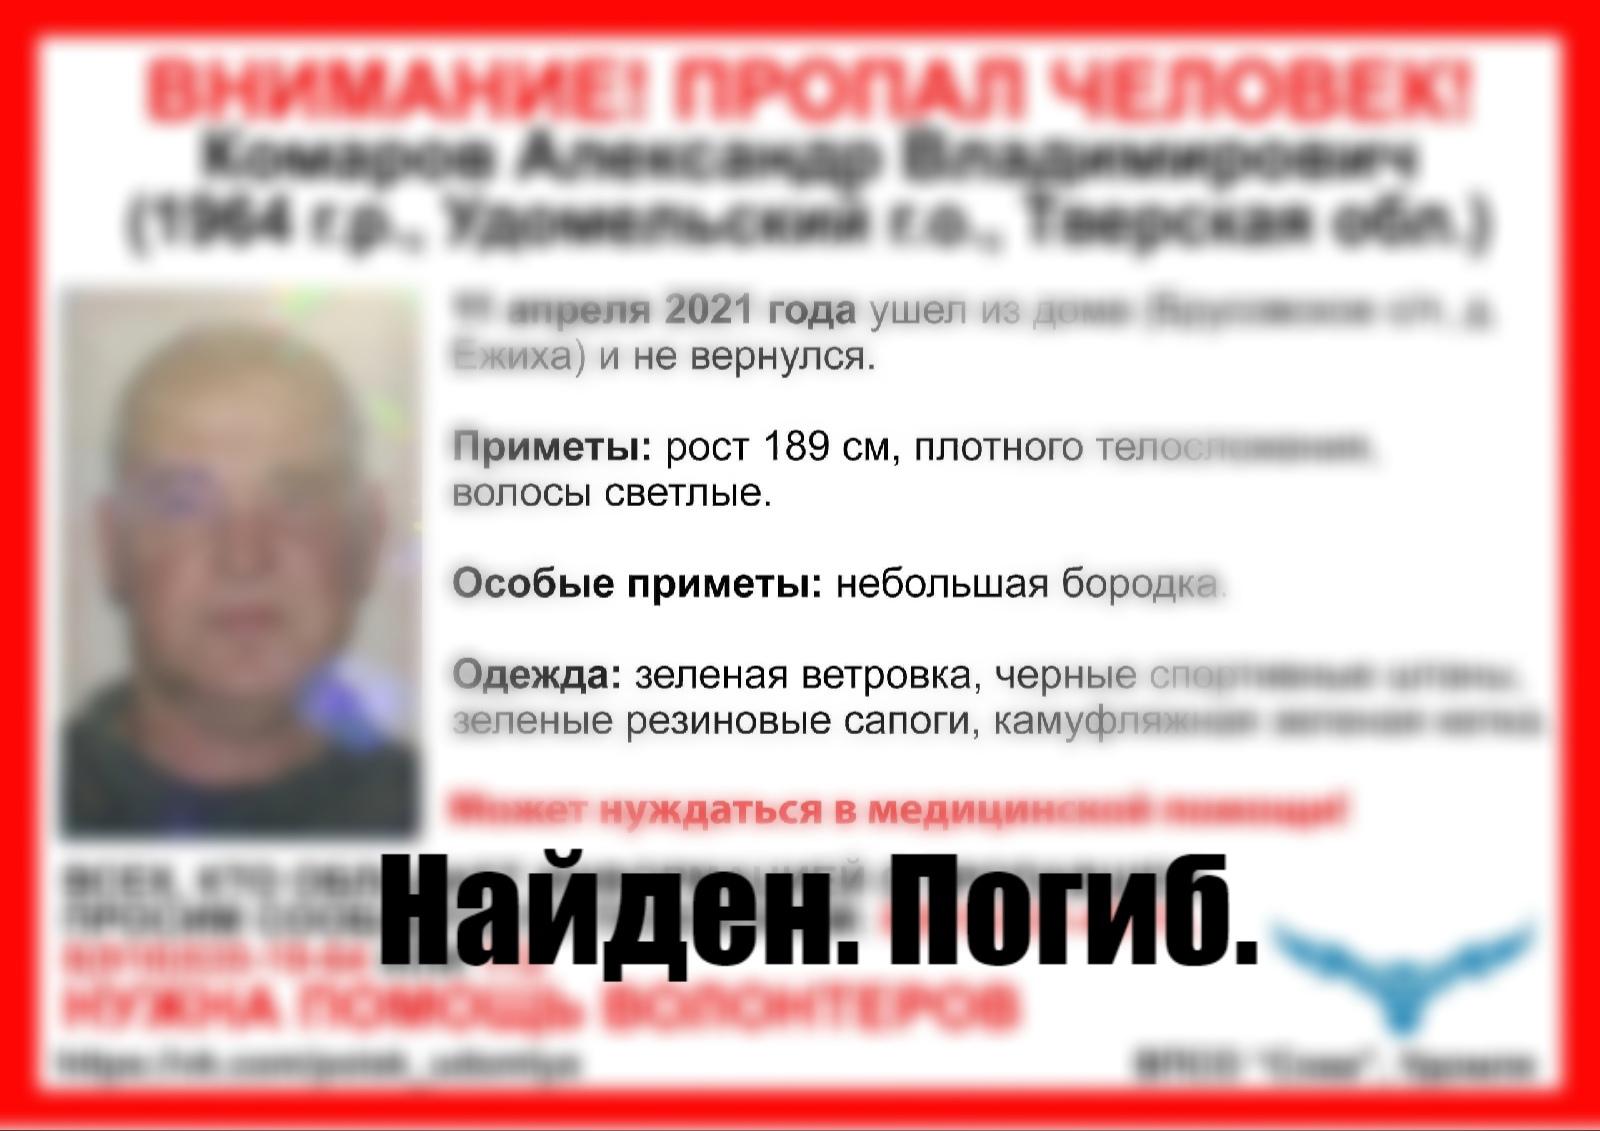 Пропавший три дня назад в Тверской области мужчина найден погибшим